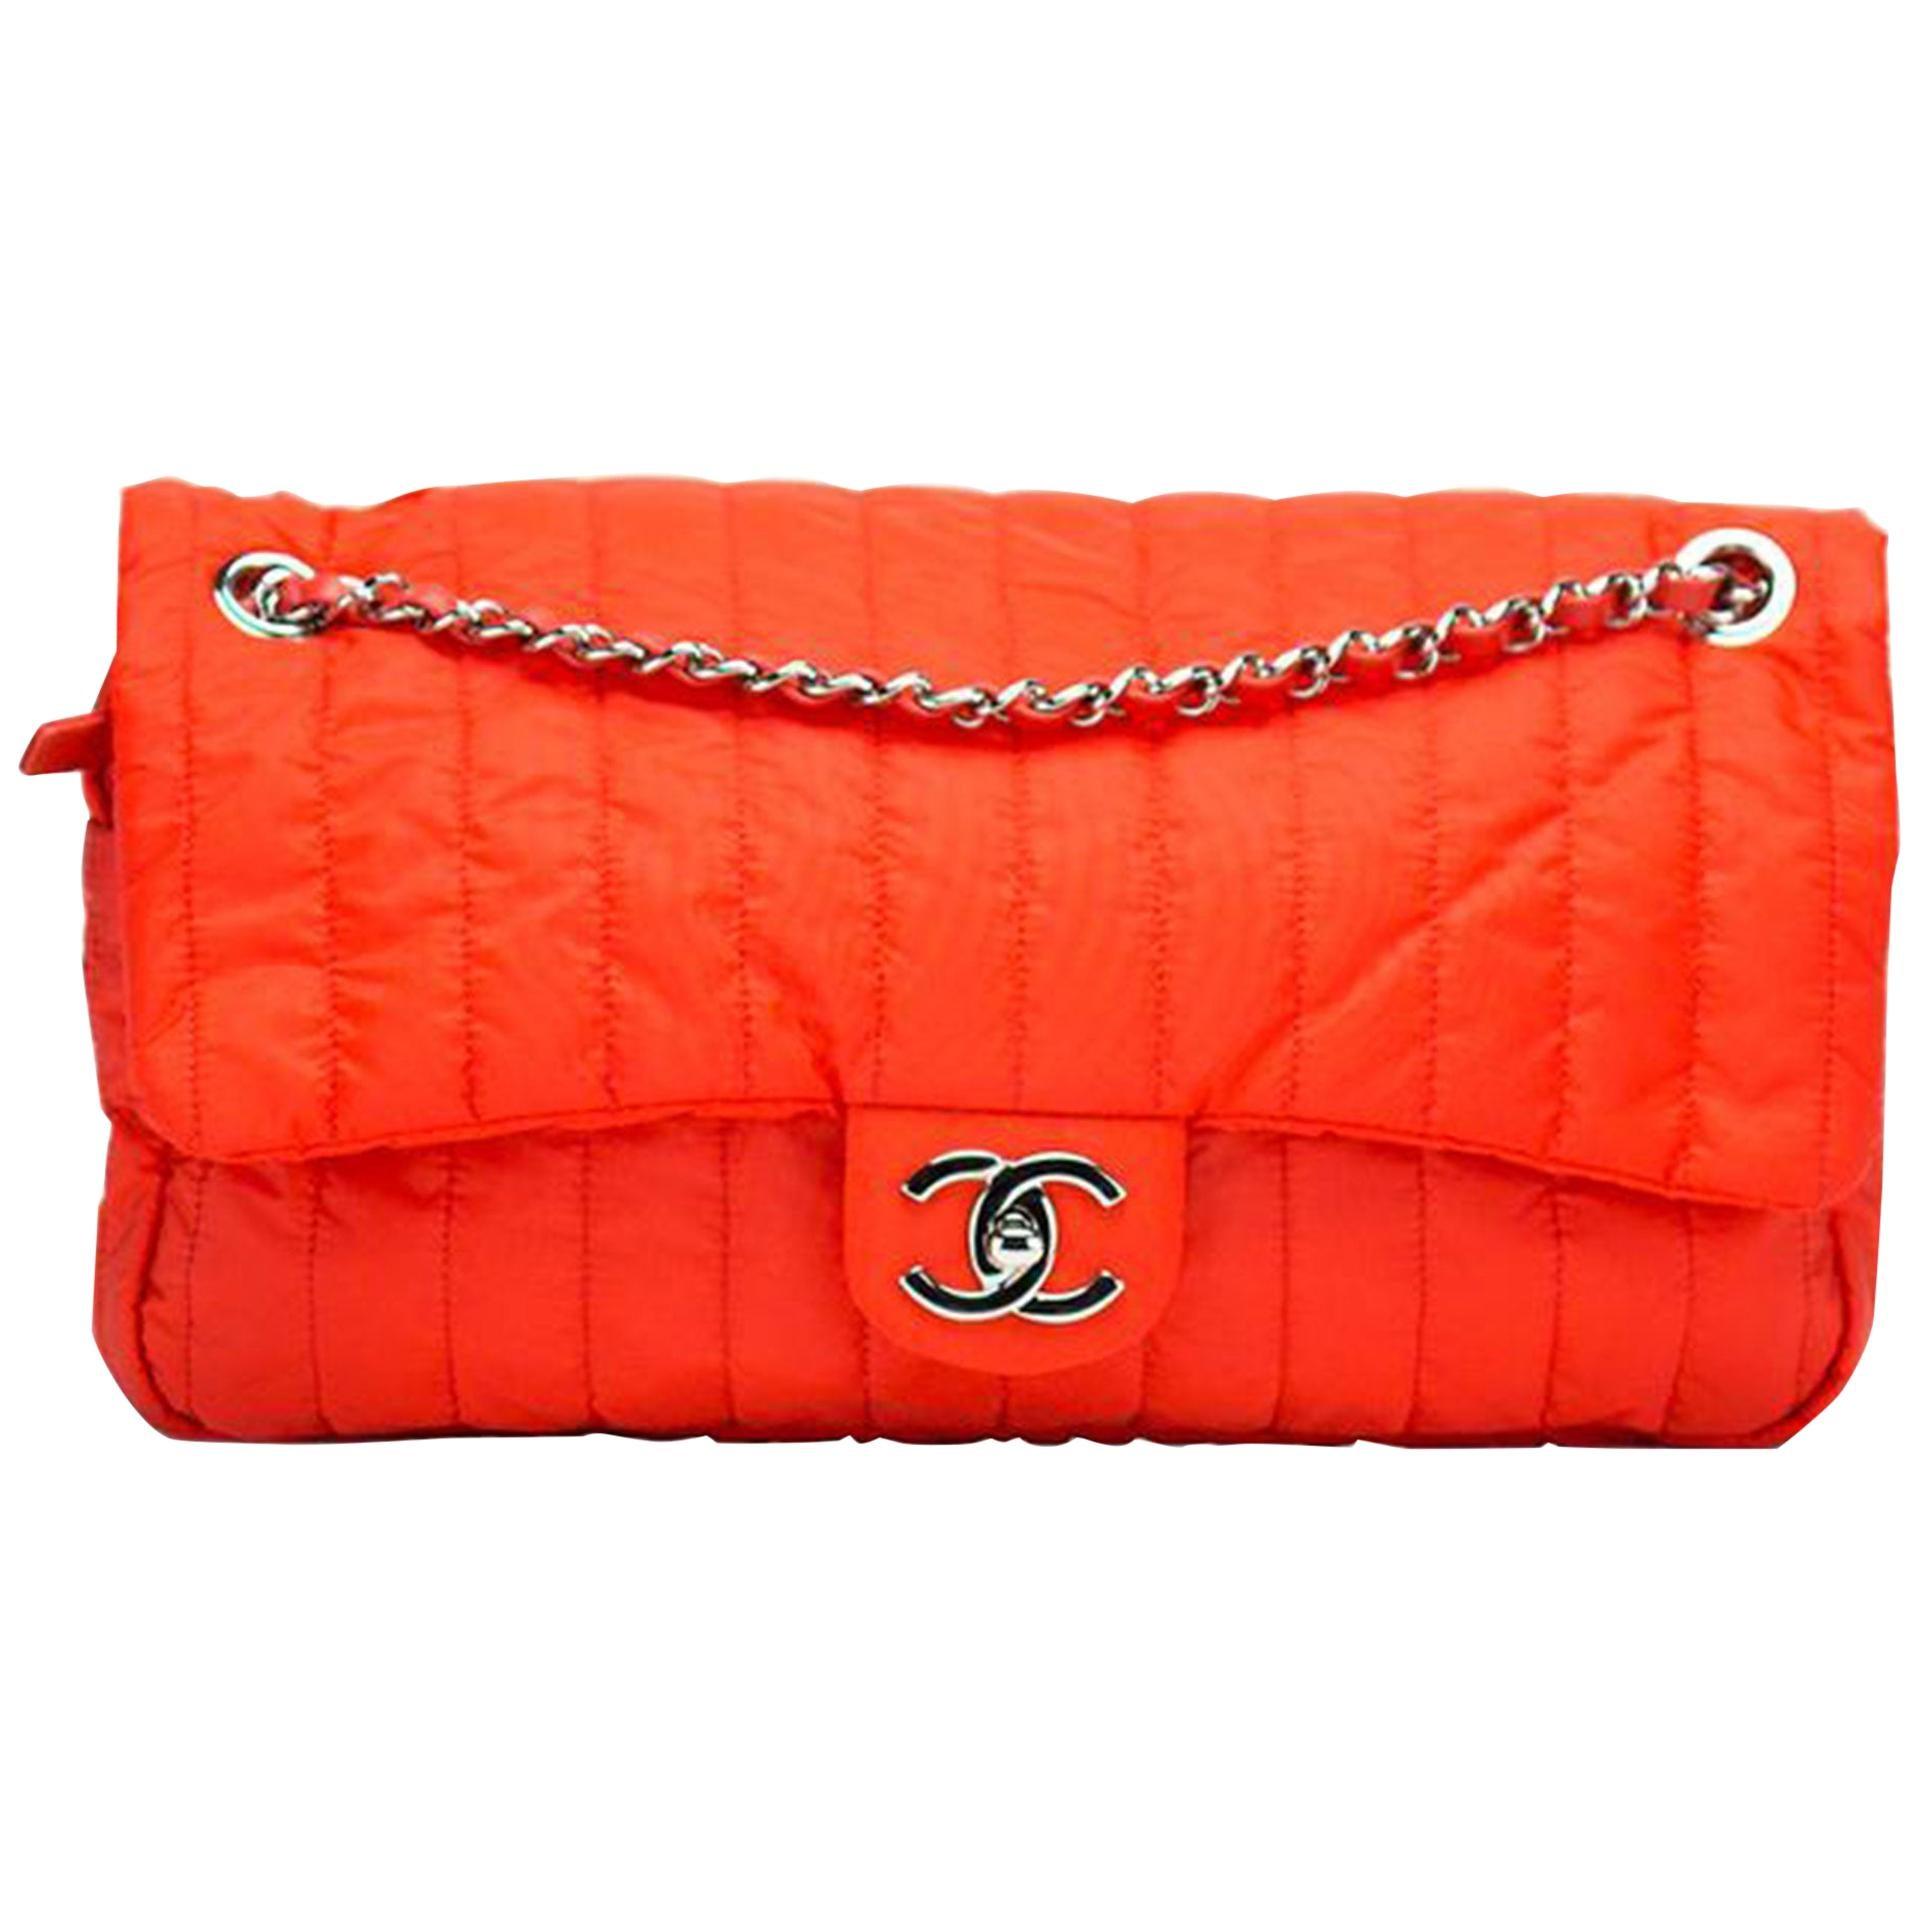 Chanel Classic Flap Soft Shell Vertical Quilted Jumbo Orange Nylon Shoulder Bag